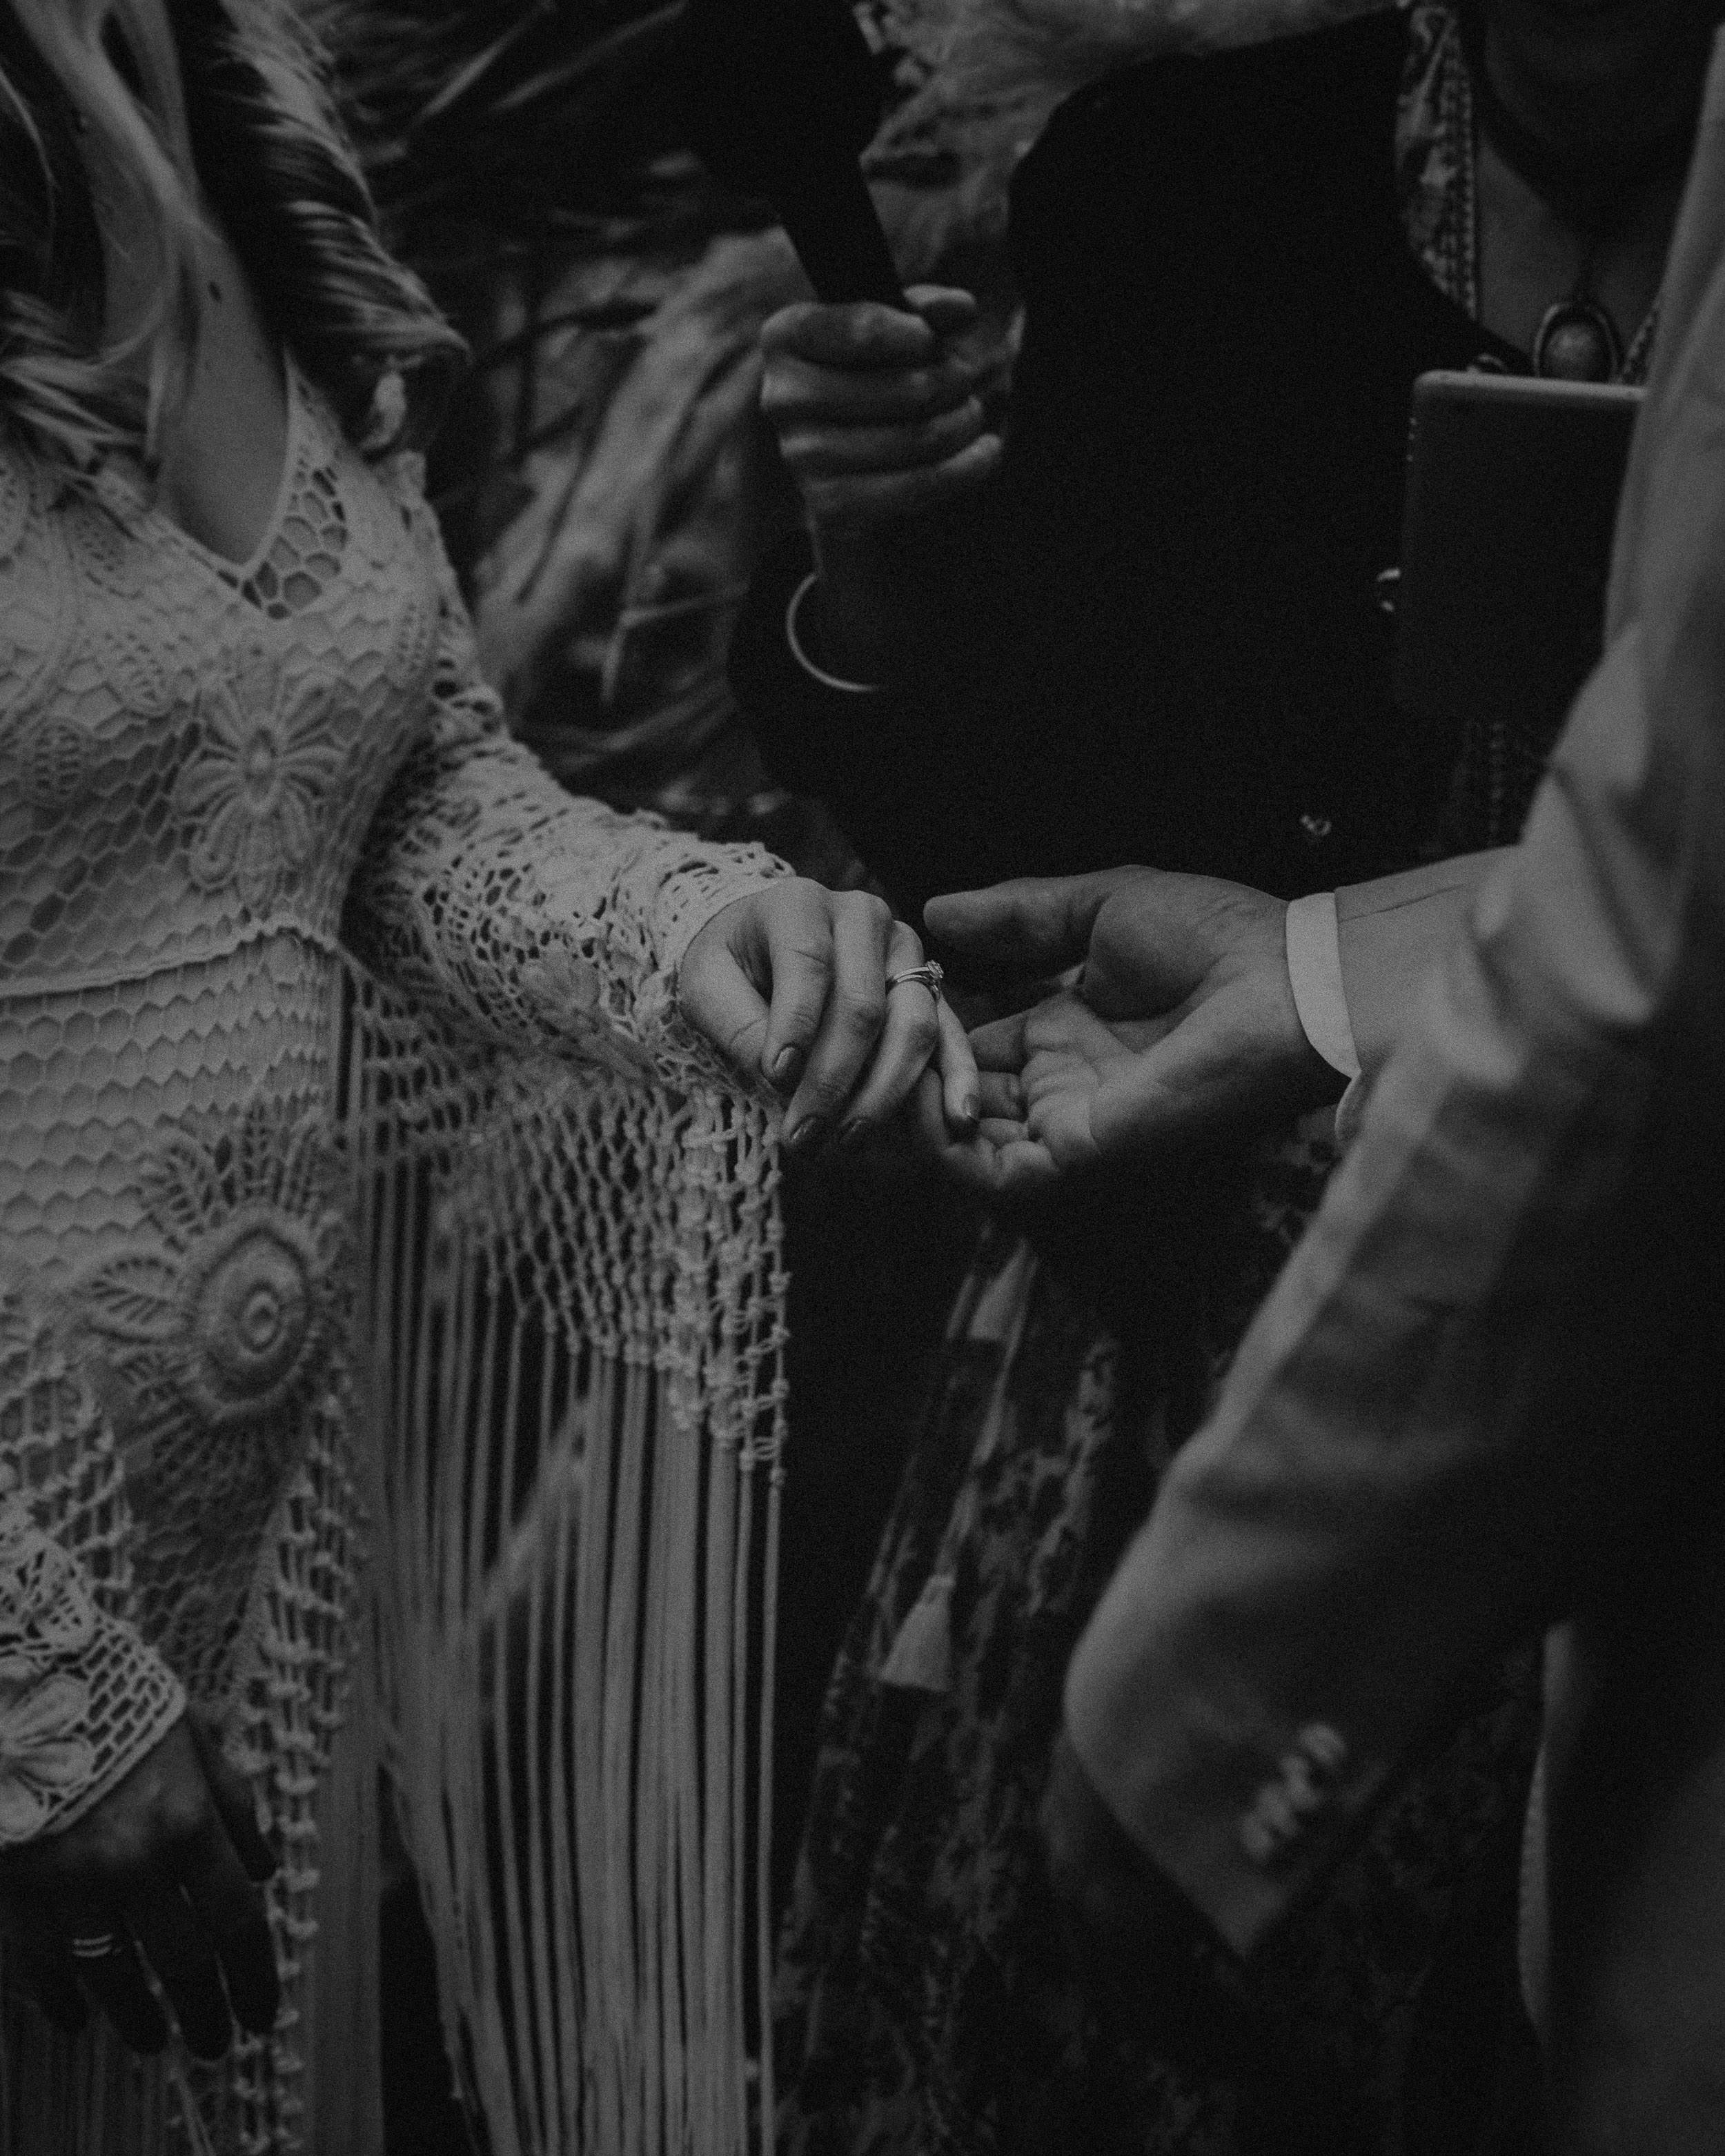 S&A Elopement - Kings & Thieves - Shred 'Til Dead - Central Coast Beach Forest Wedding - 223.jpg